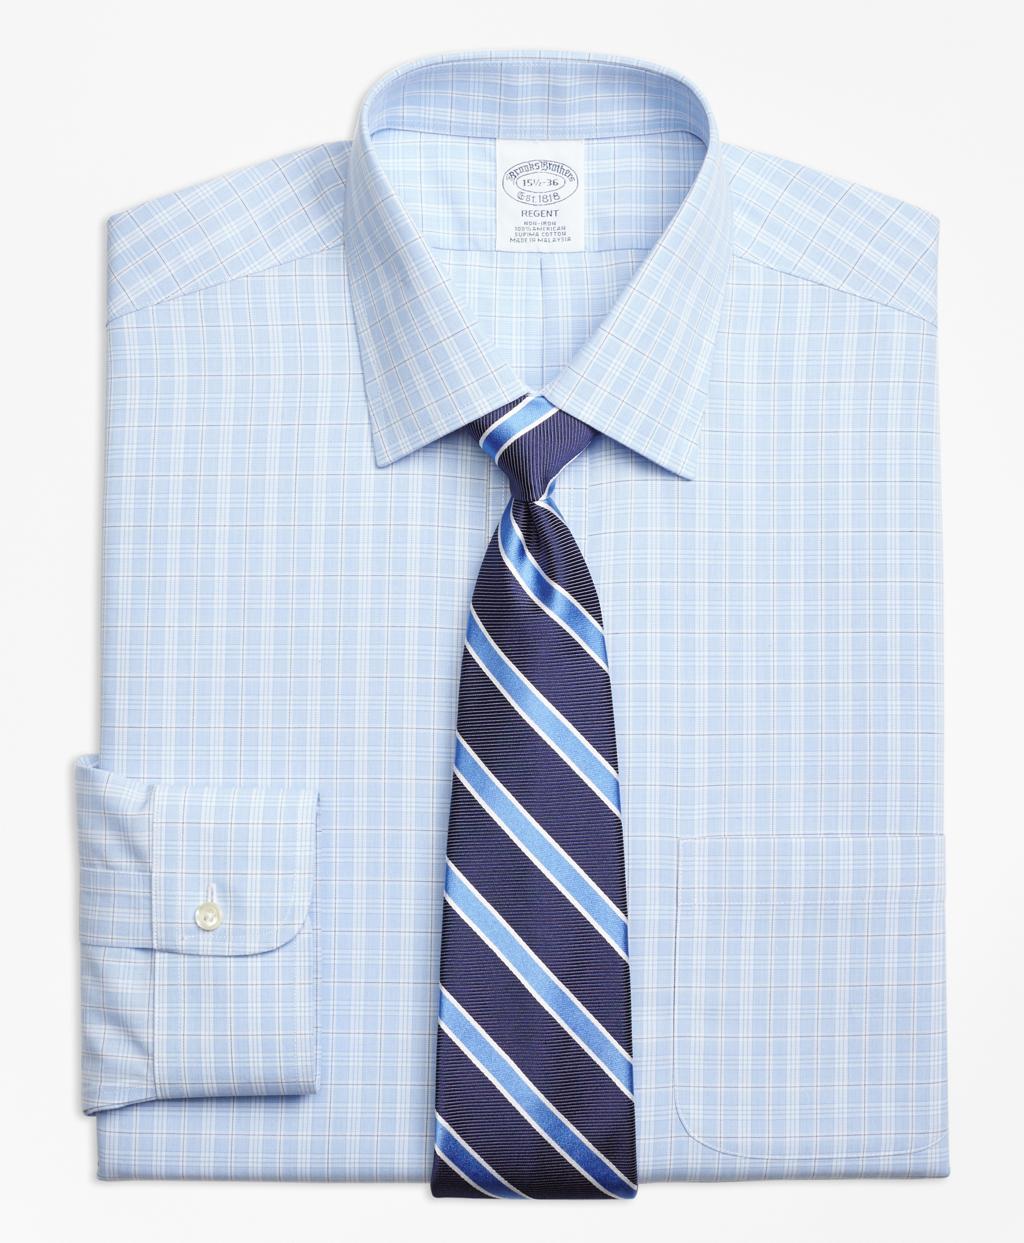 Brooks brothers non iron regent fit overcheck dress shirt for Brooks brothers dress shirt fit